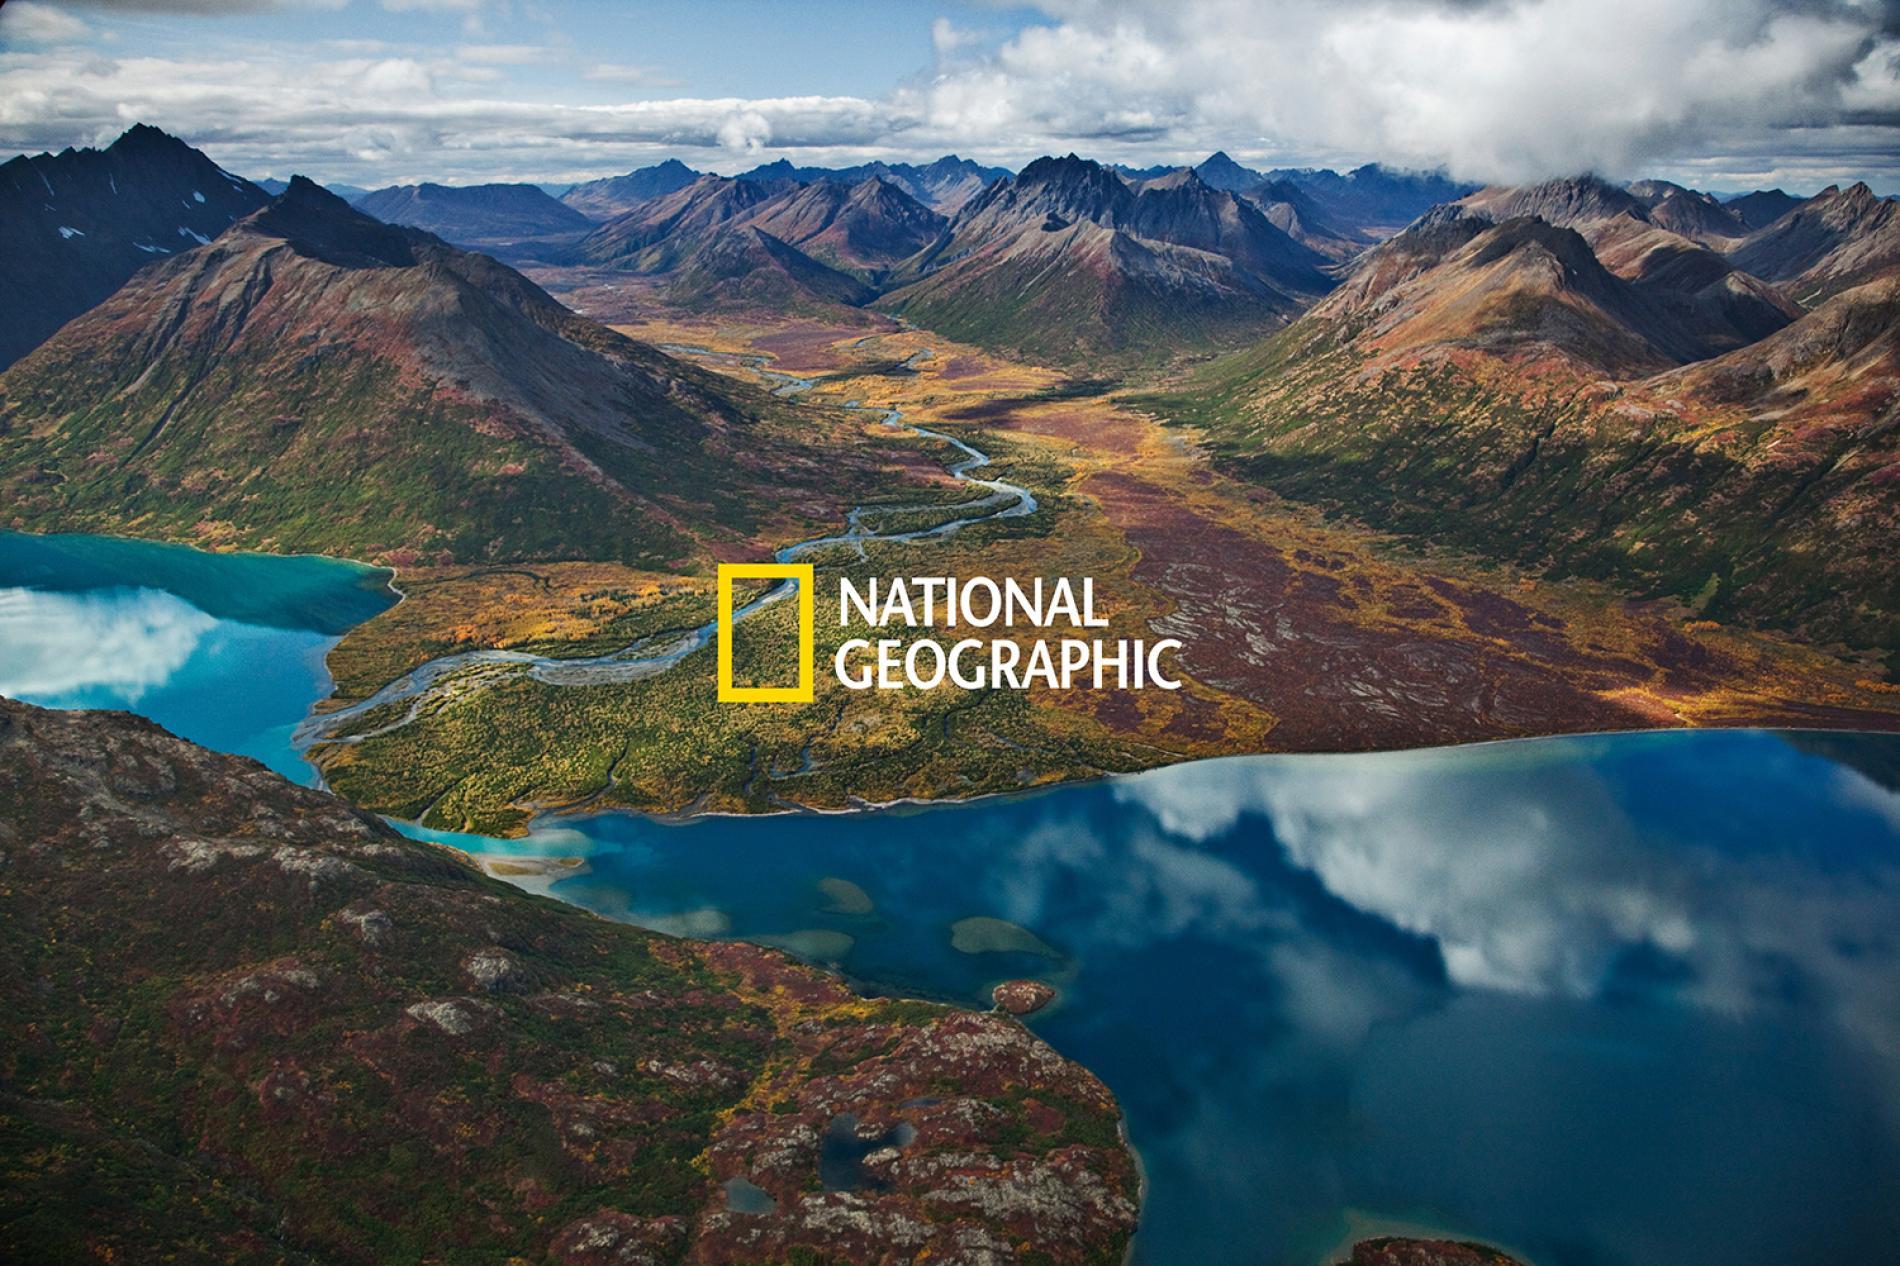 nationalgeographicog.ngsversion.1530540626597.adapt.1900.1.jpg